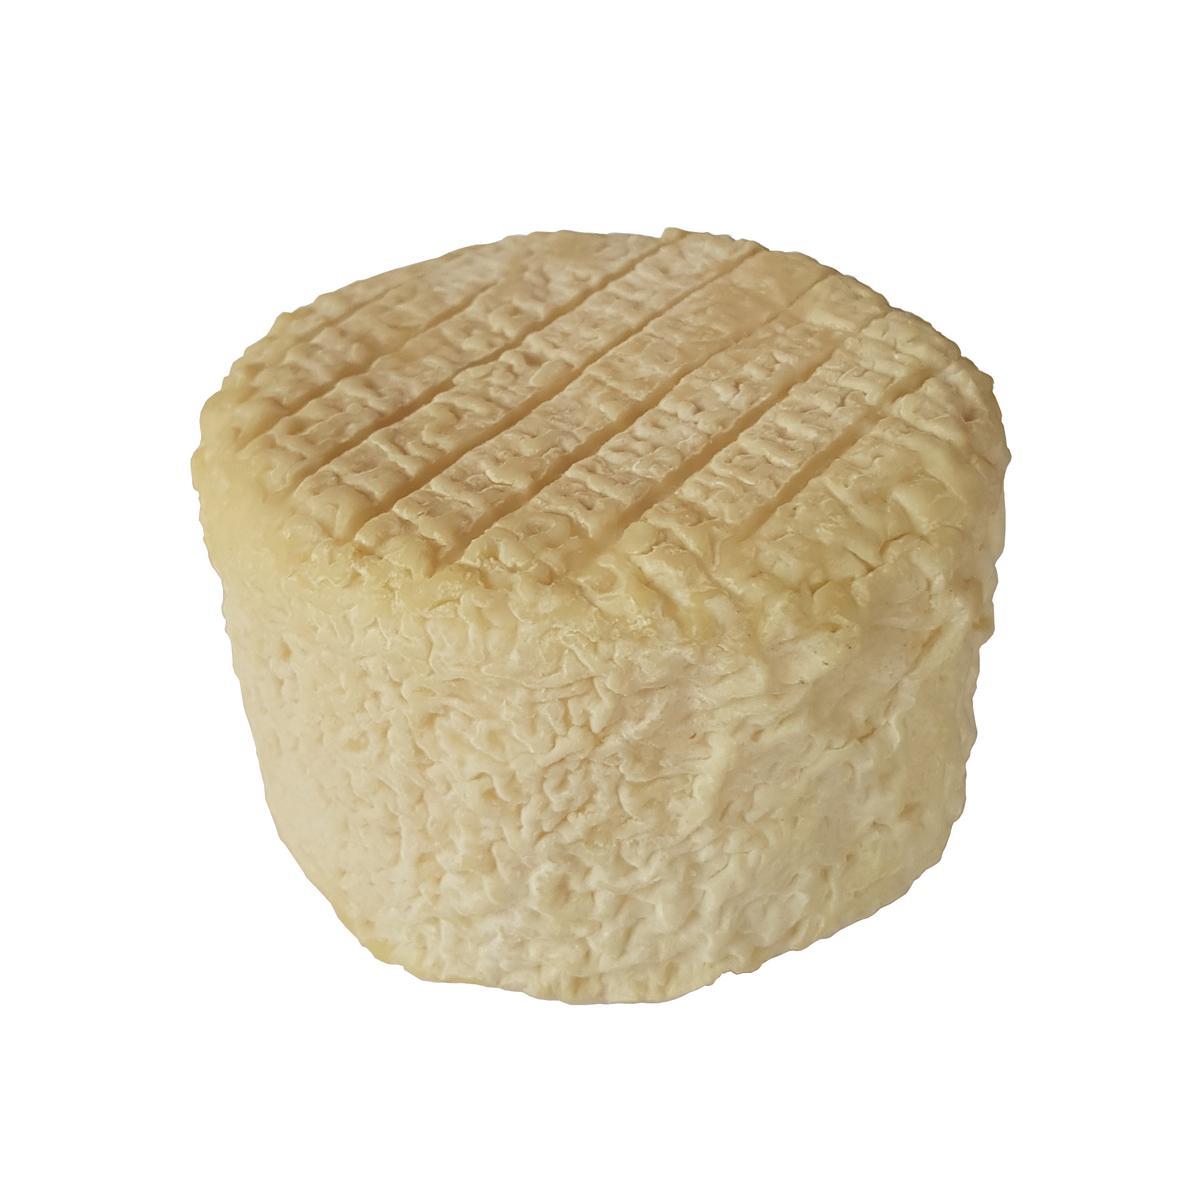 Bonde d'antan du Poitou (200 g)